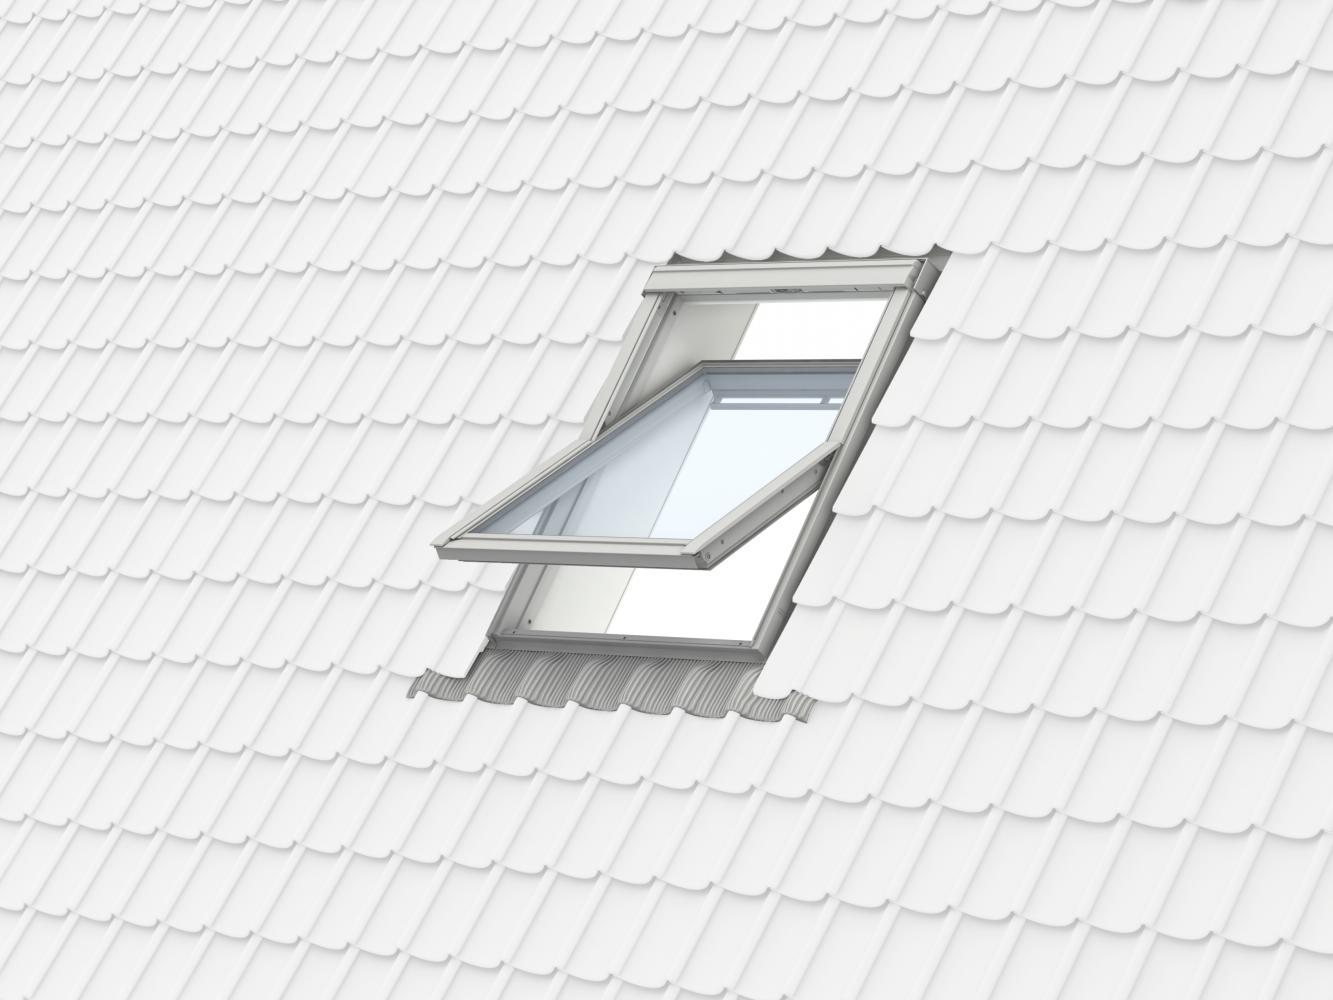 Fereastra de mansarda Velux GZL 1051 Standard, deschidere de sus, MK06 78x118 cm